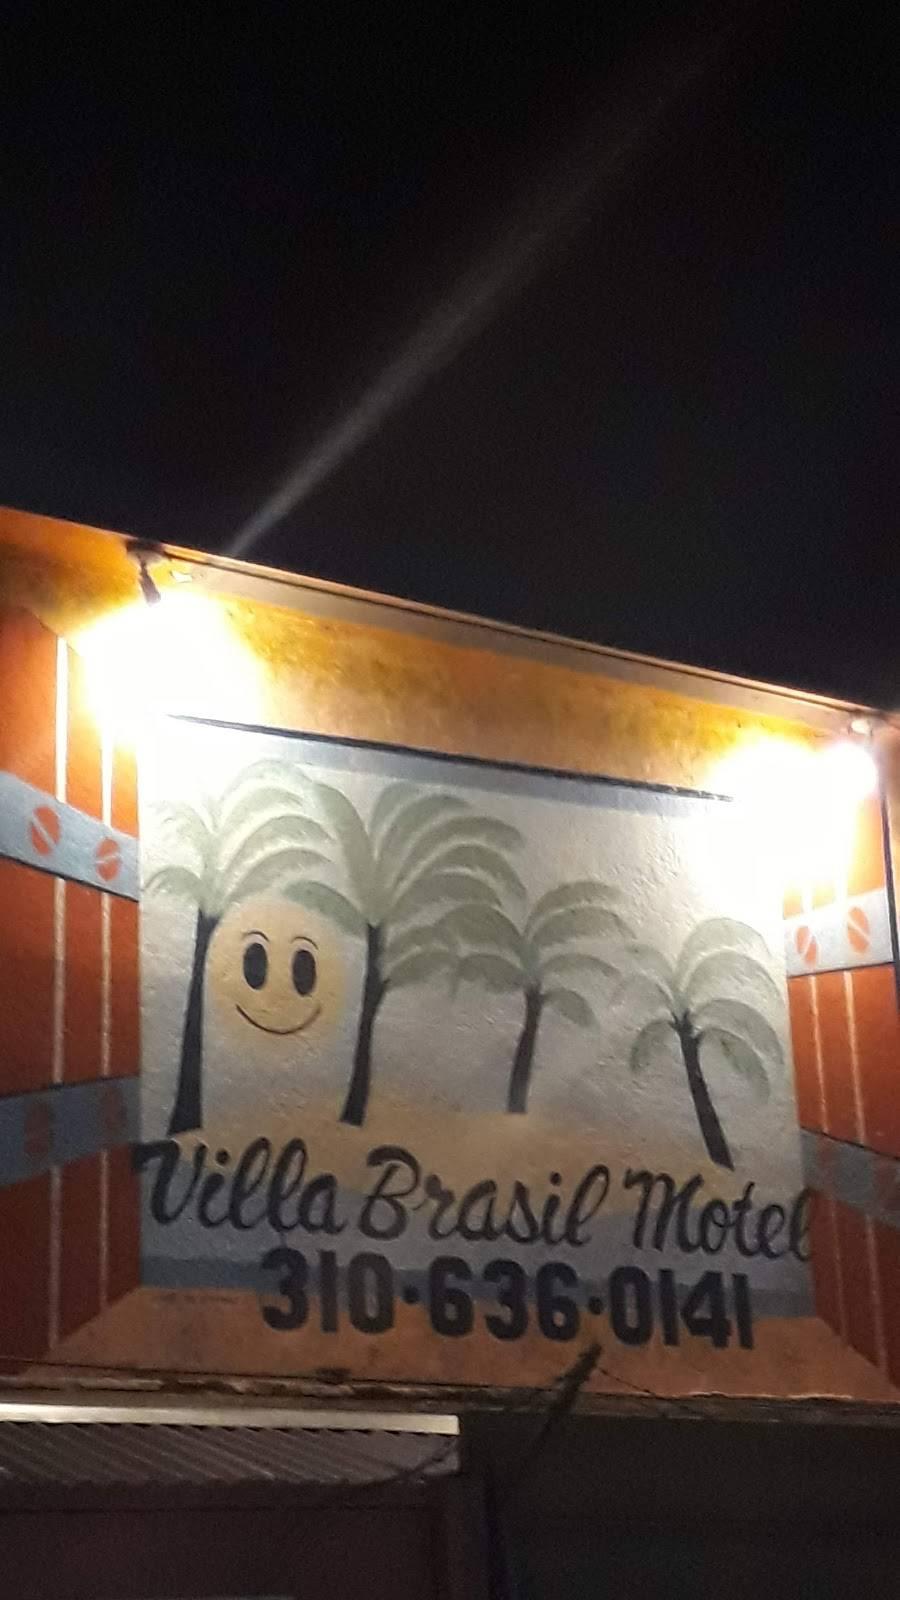 Viva Brazil Motel Restaurant 11740 W Washington Blvd